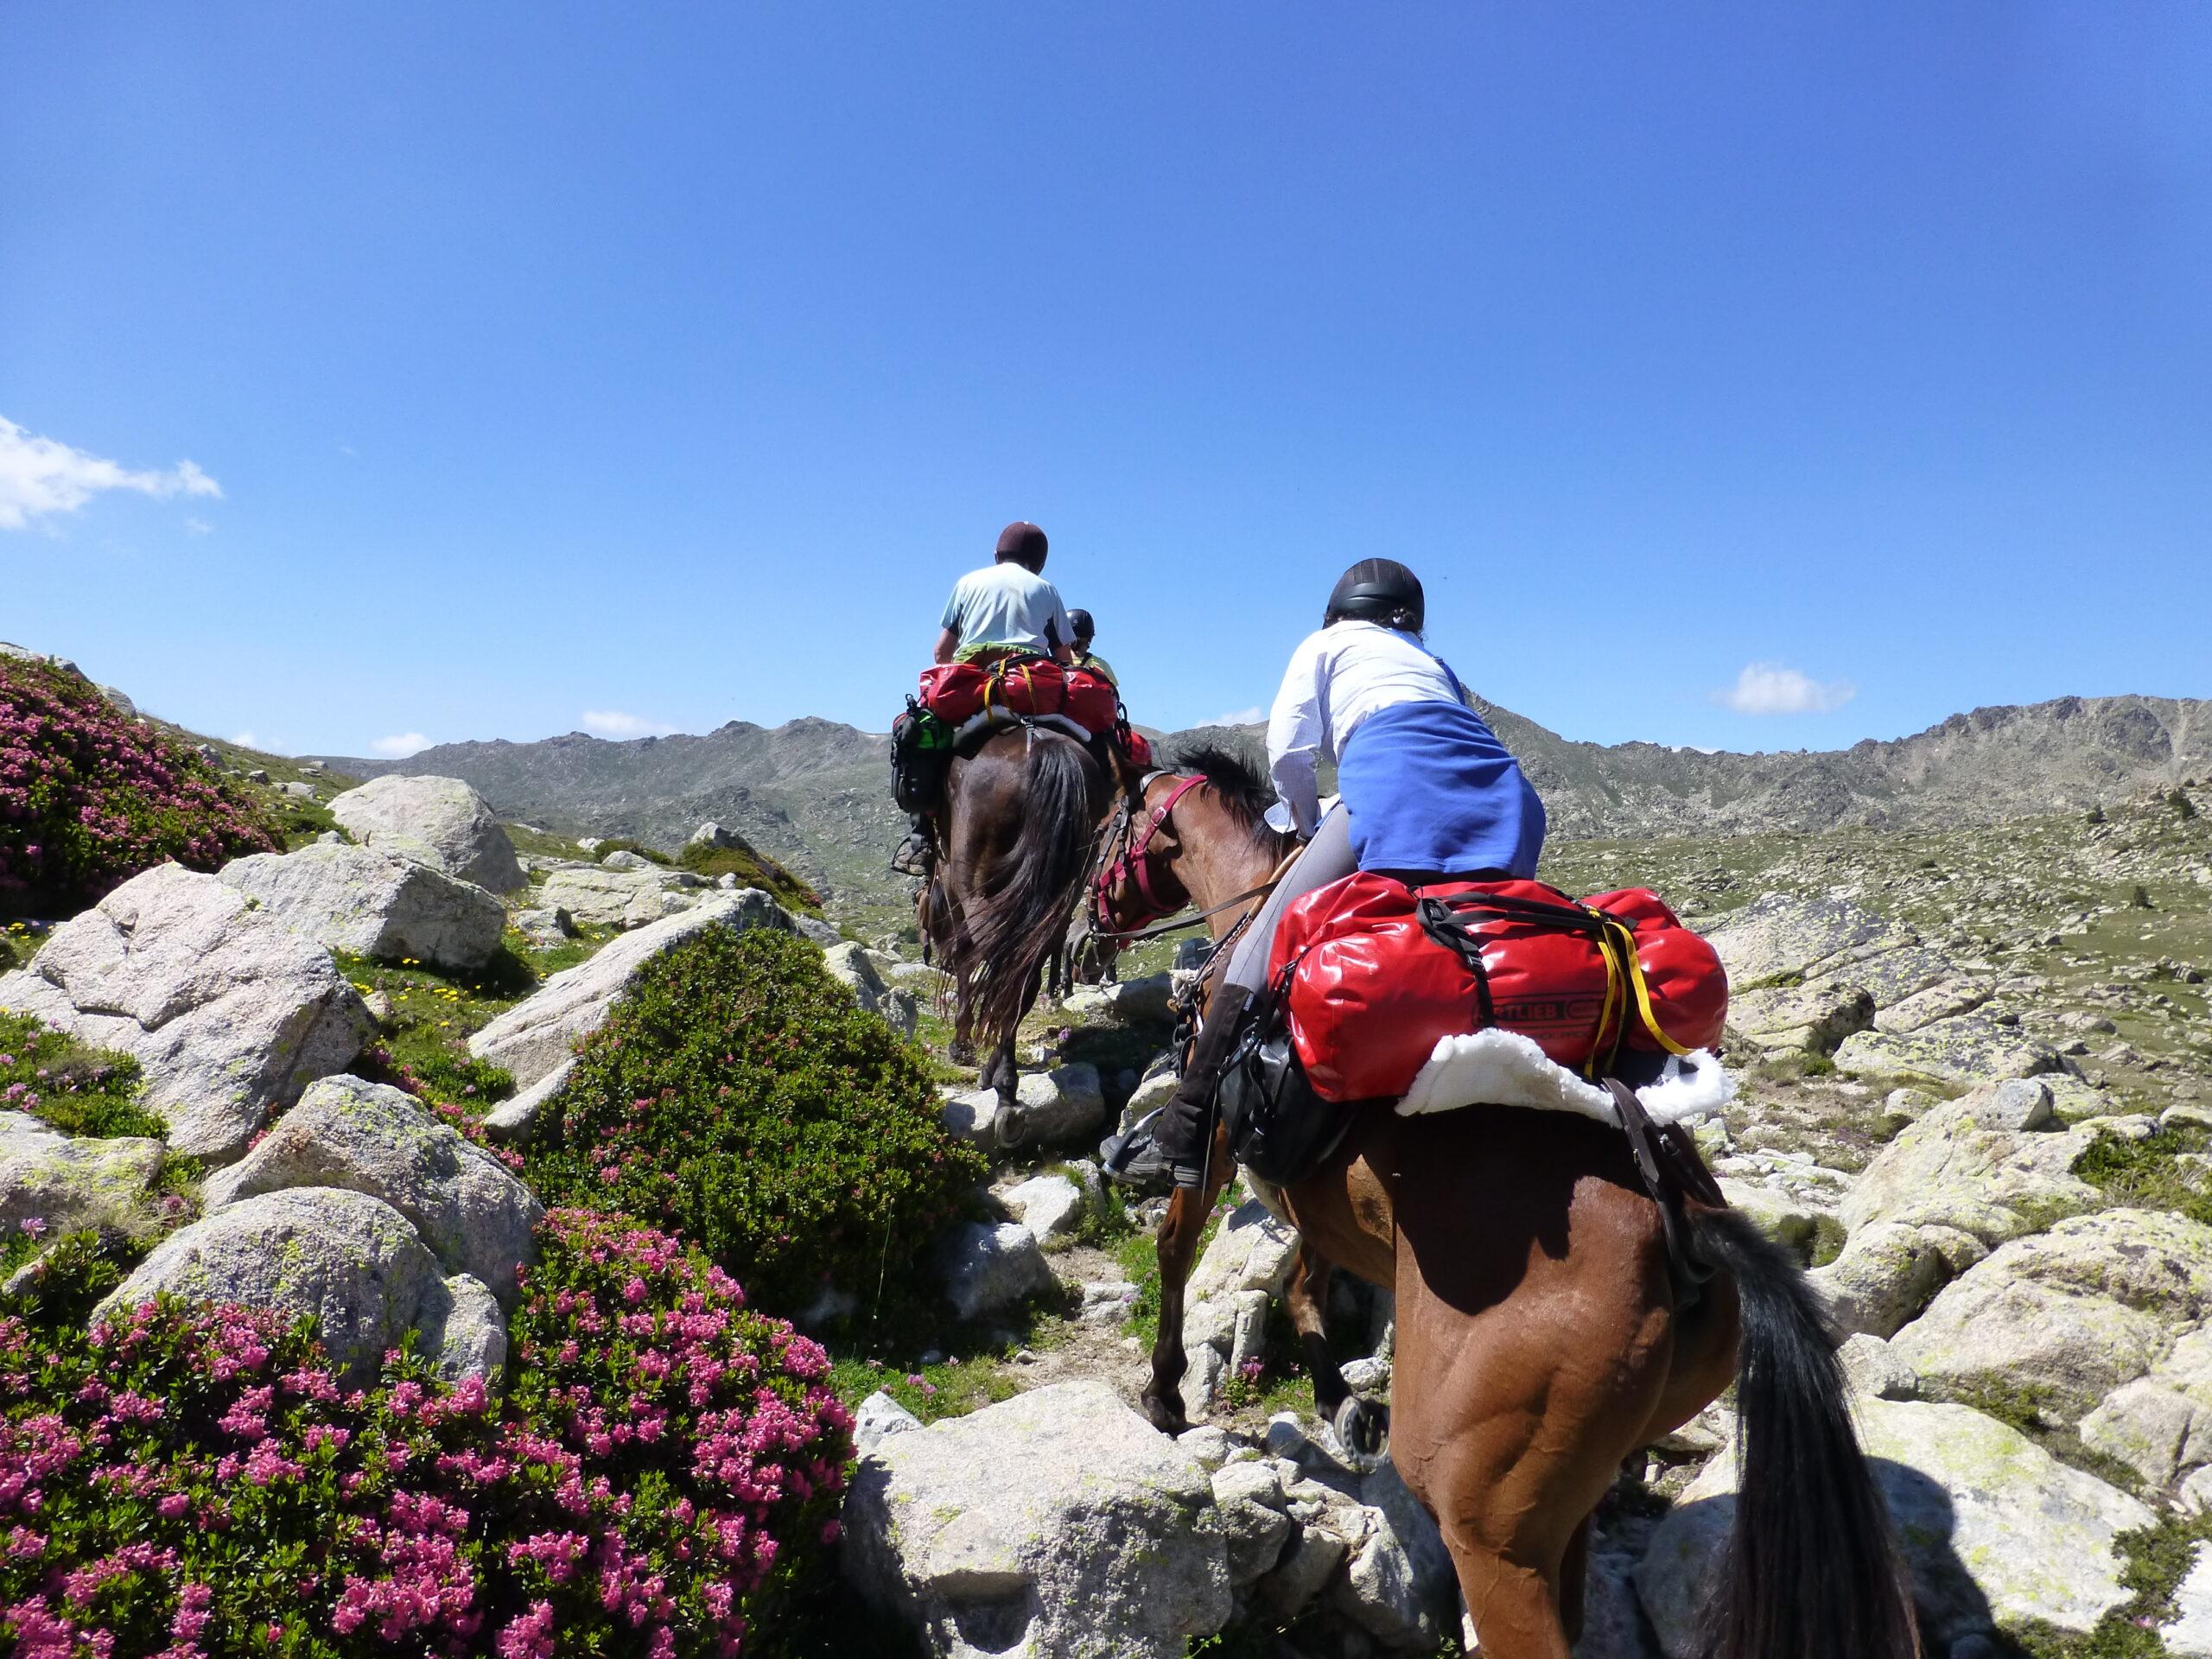 Andorra trekking te paard - Vakantie te paard / Reisbureau Perlan